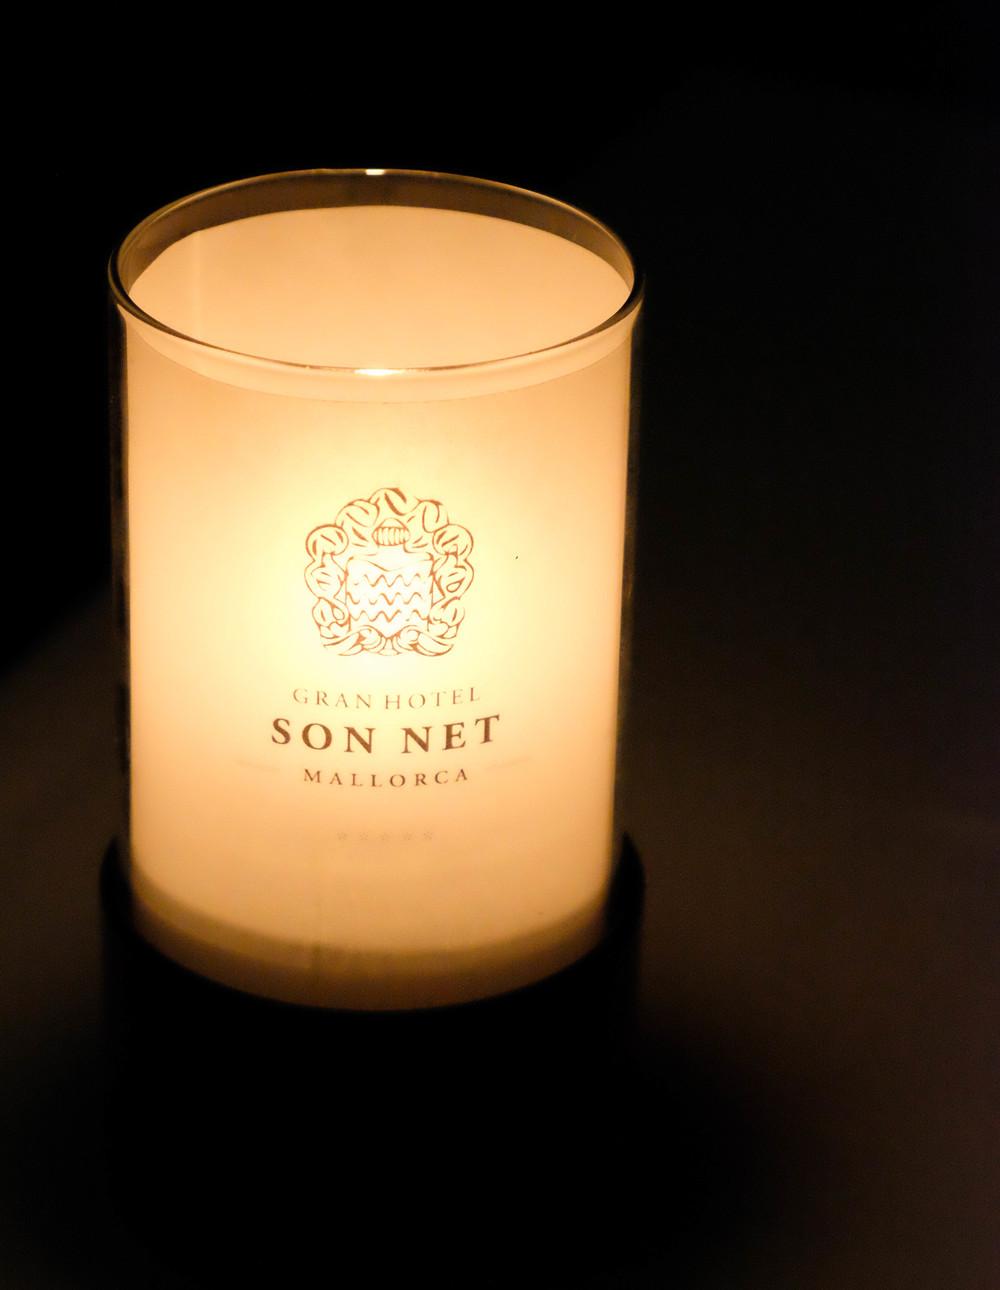 LaurenSchwaiger-Travel-Blog-Gran-Hotel-Son-Net-Candle.jpg